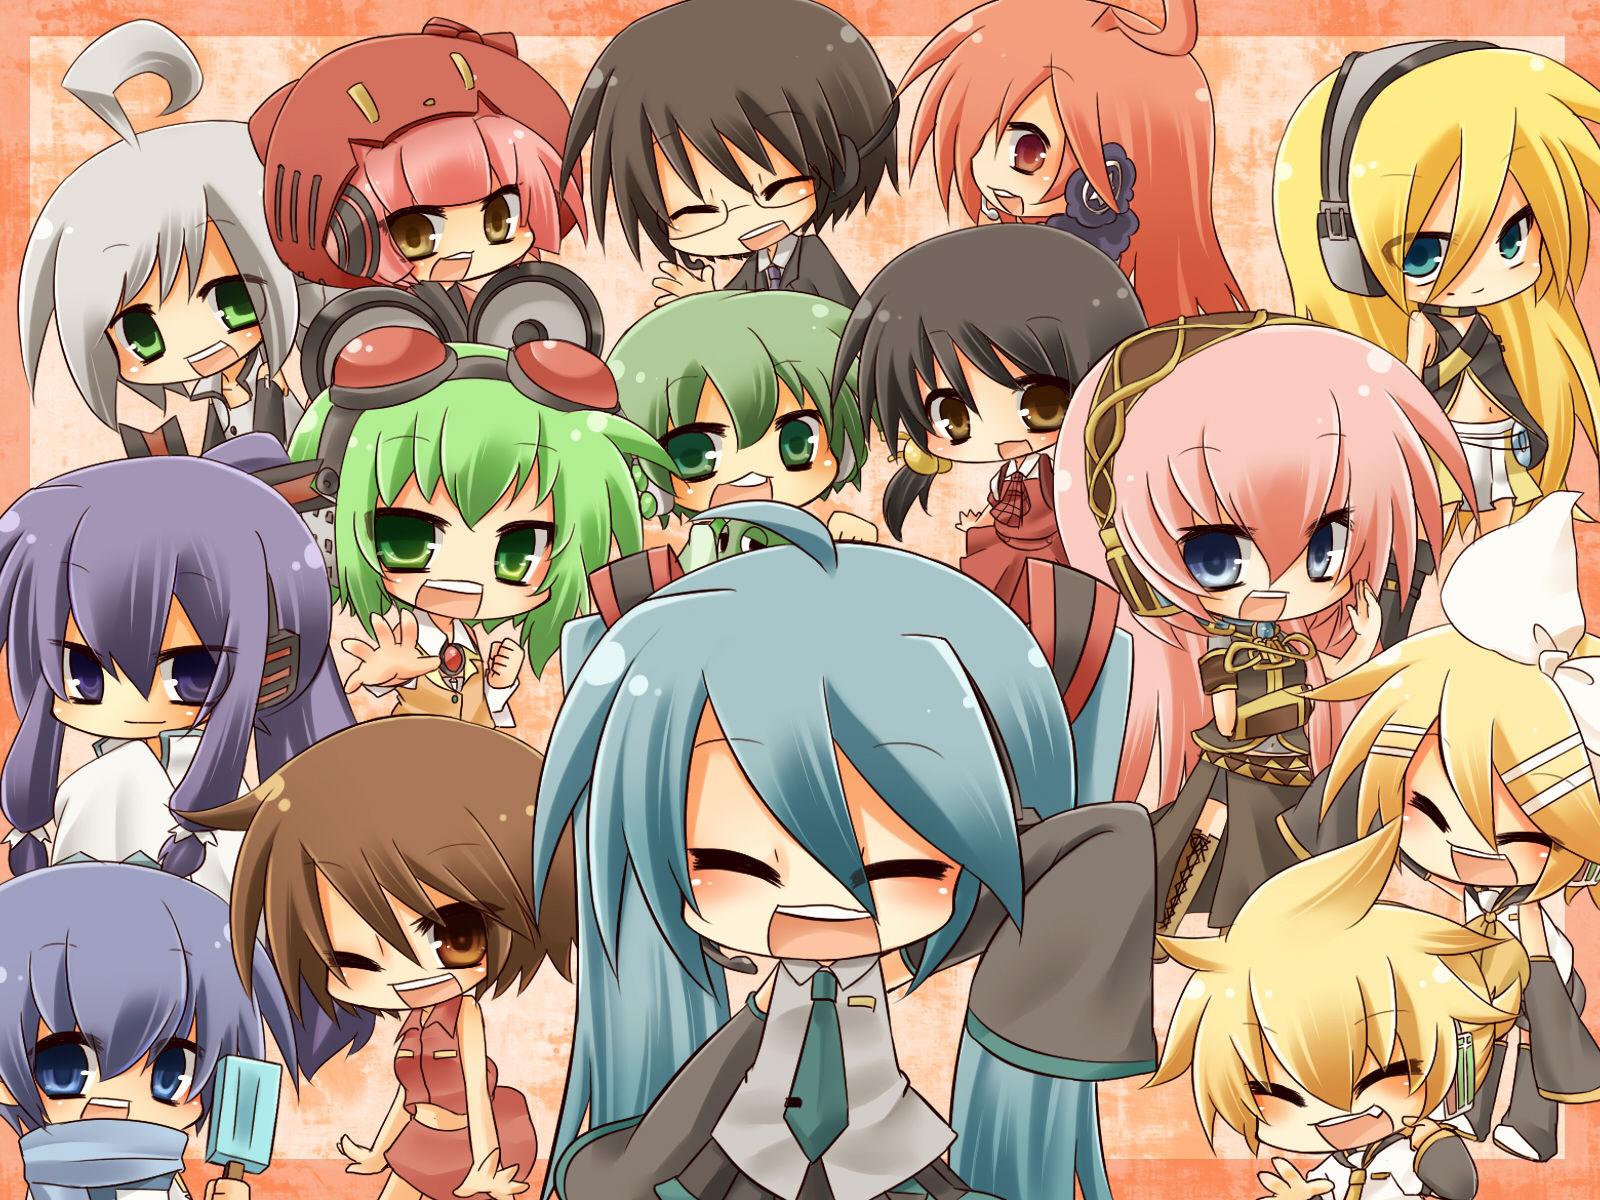 Vocaloid Chibi Group Wallpaper 求v家q版图片_百�...